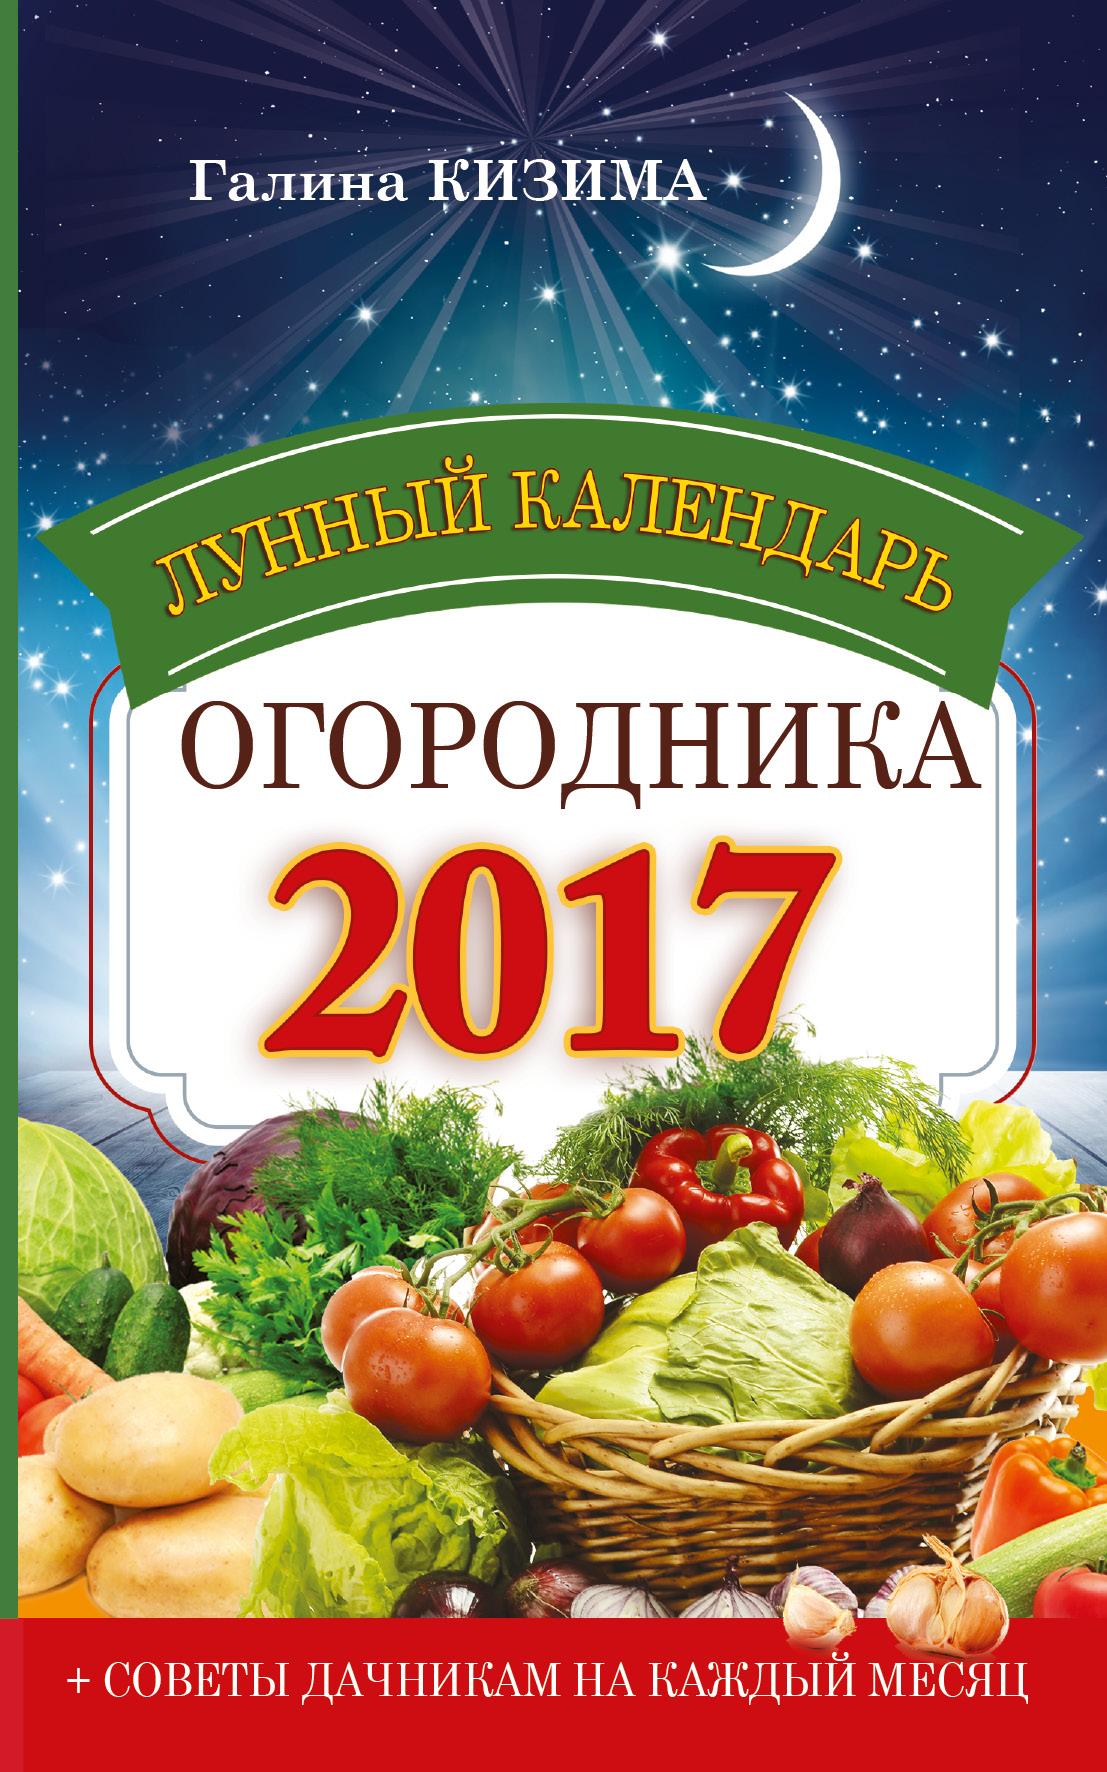 Галина Кизима Лунный календарь огородника на 2017 год цена 2017